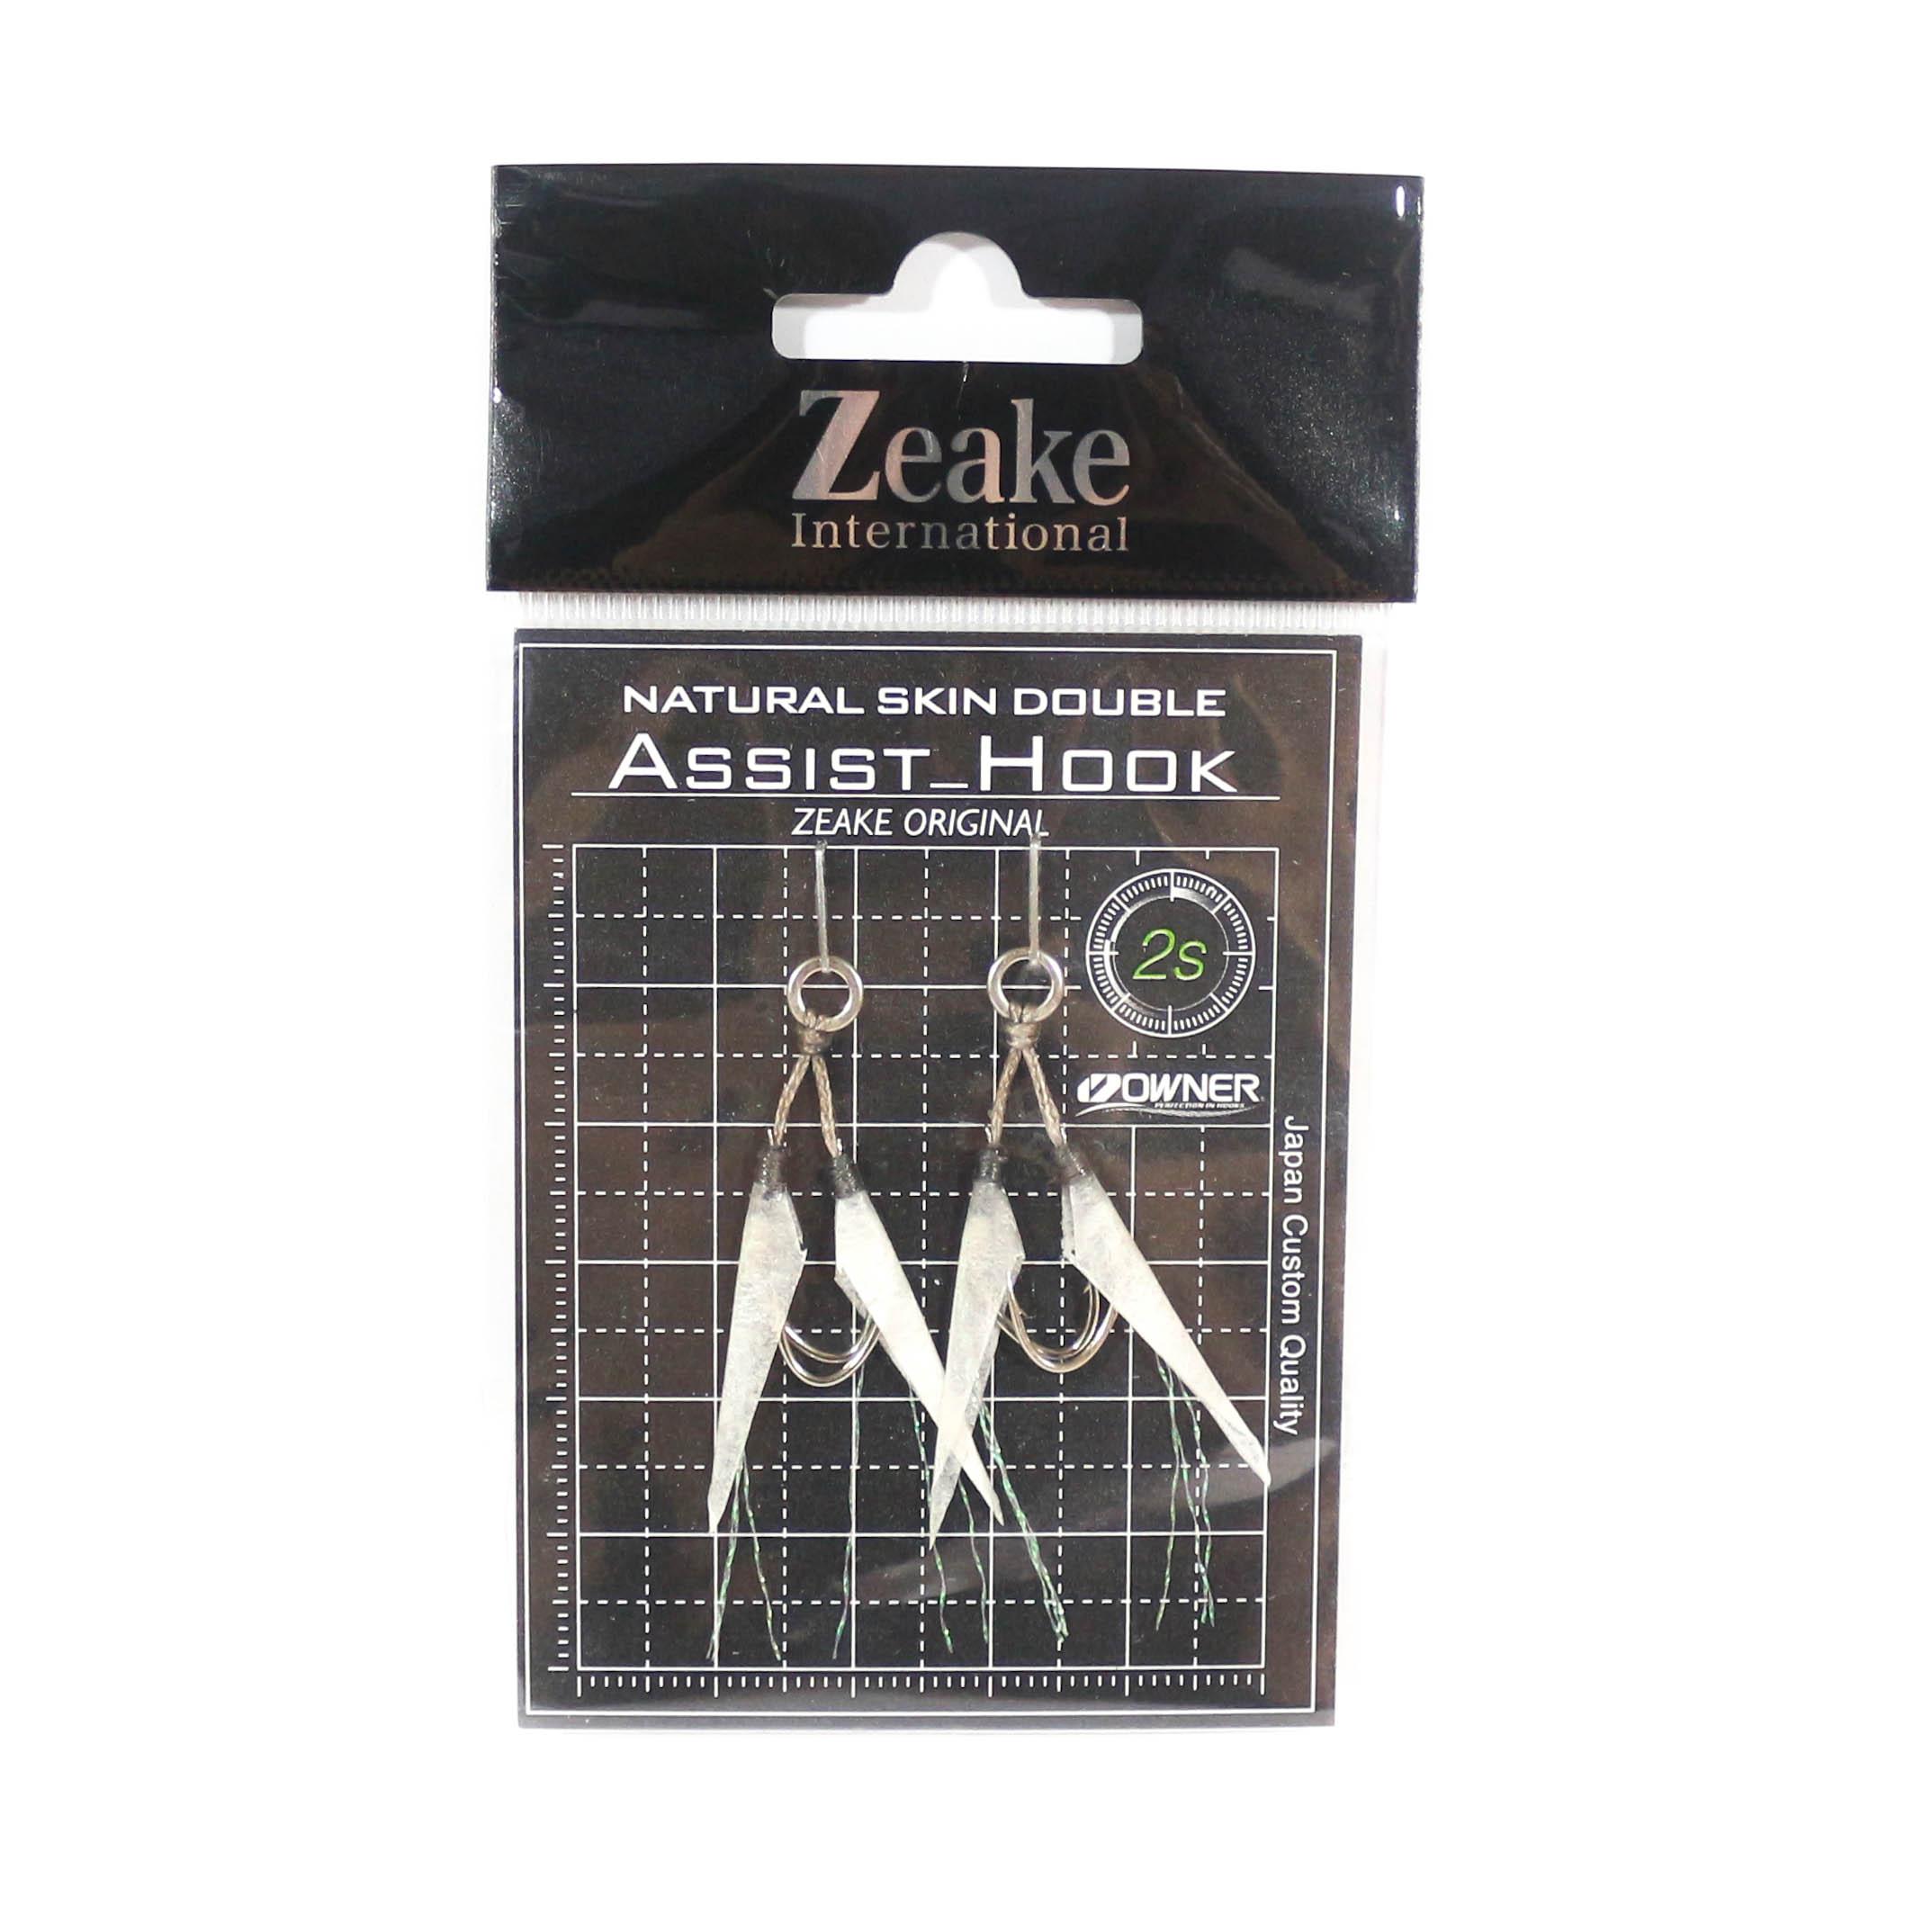 Zeake Assist Hook Double Fish Skin SLJ 2 per pack 2S (Size 9) (3049)